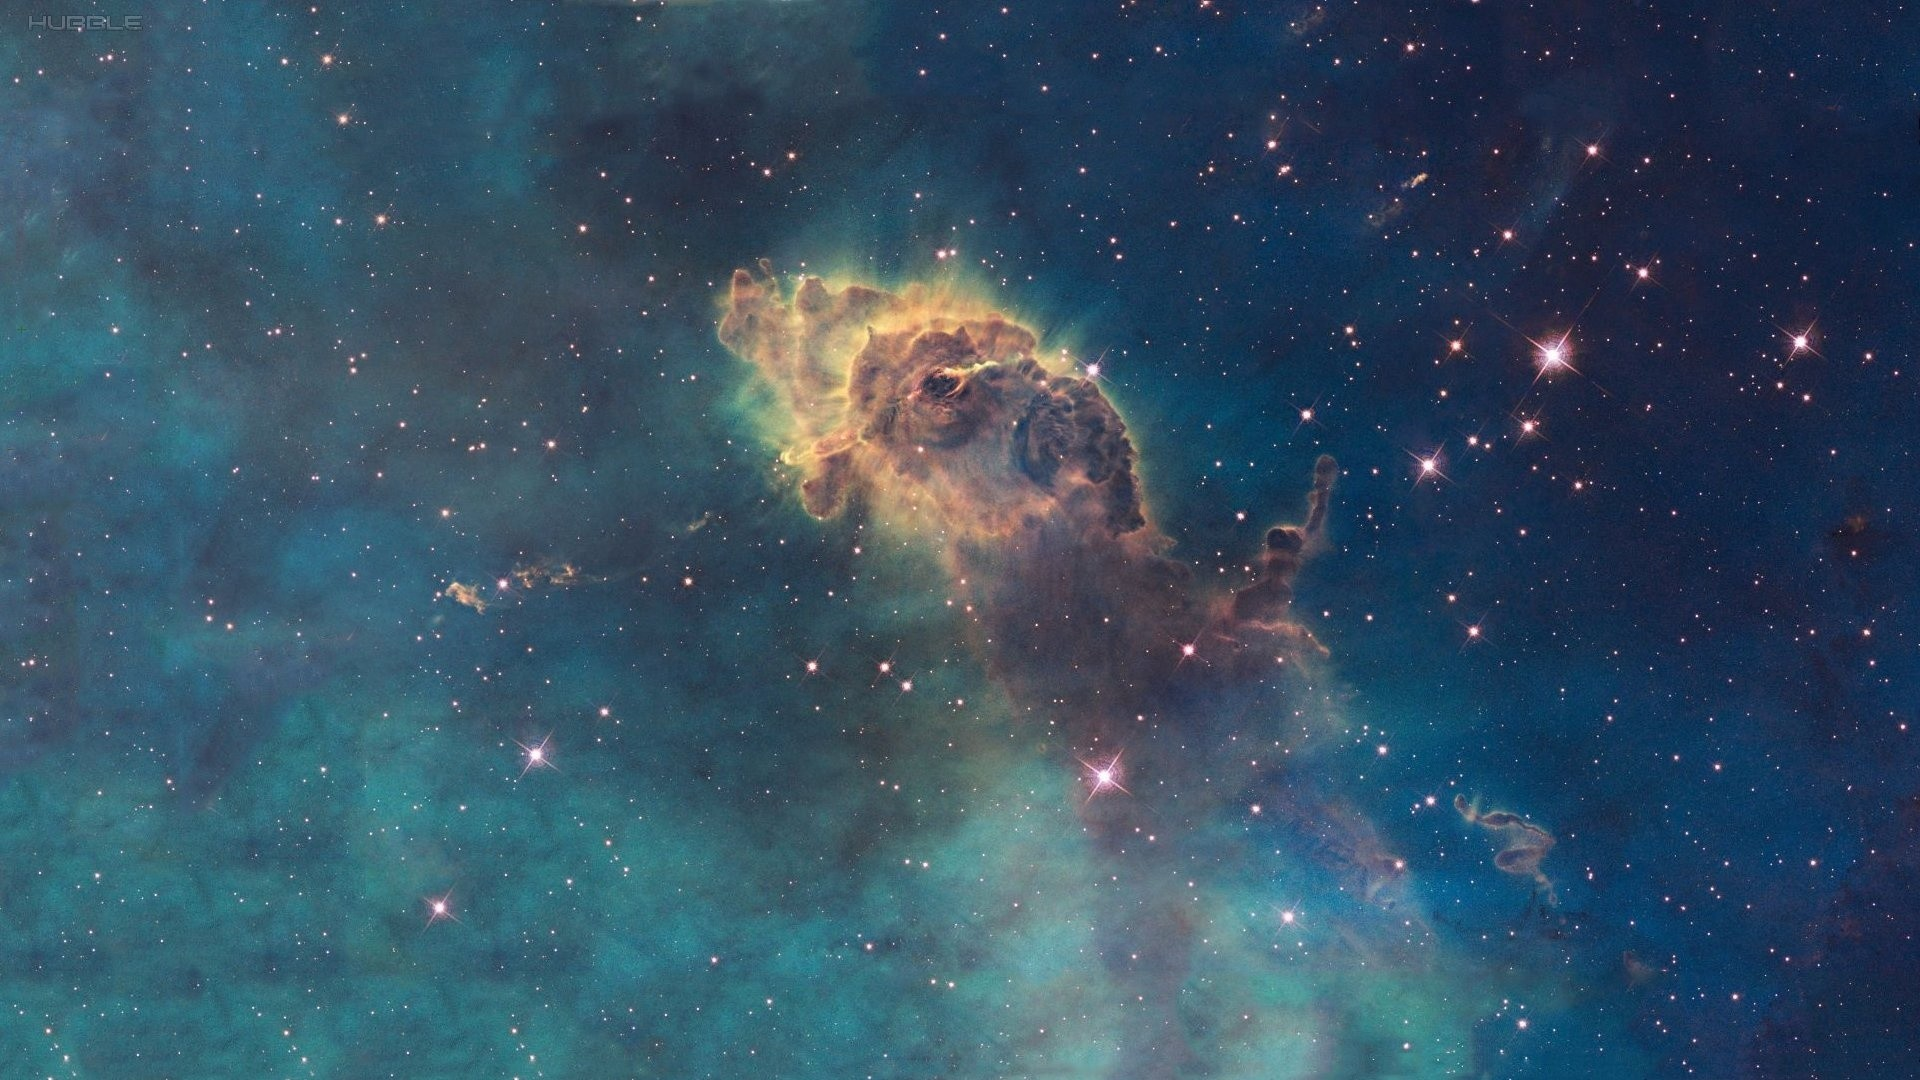 Wallpaper space, stars, nebula, hubble, carina nebula desktop .